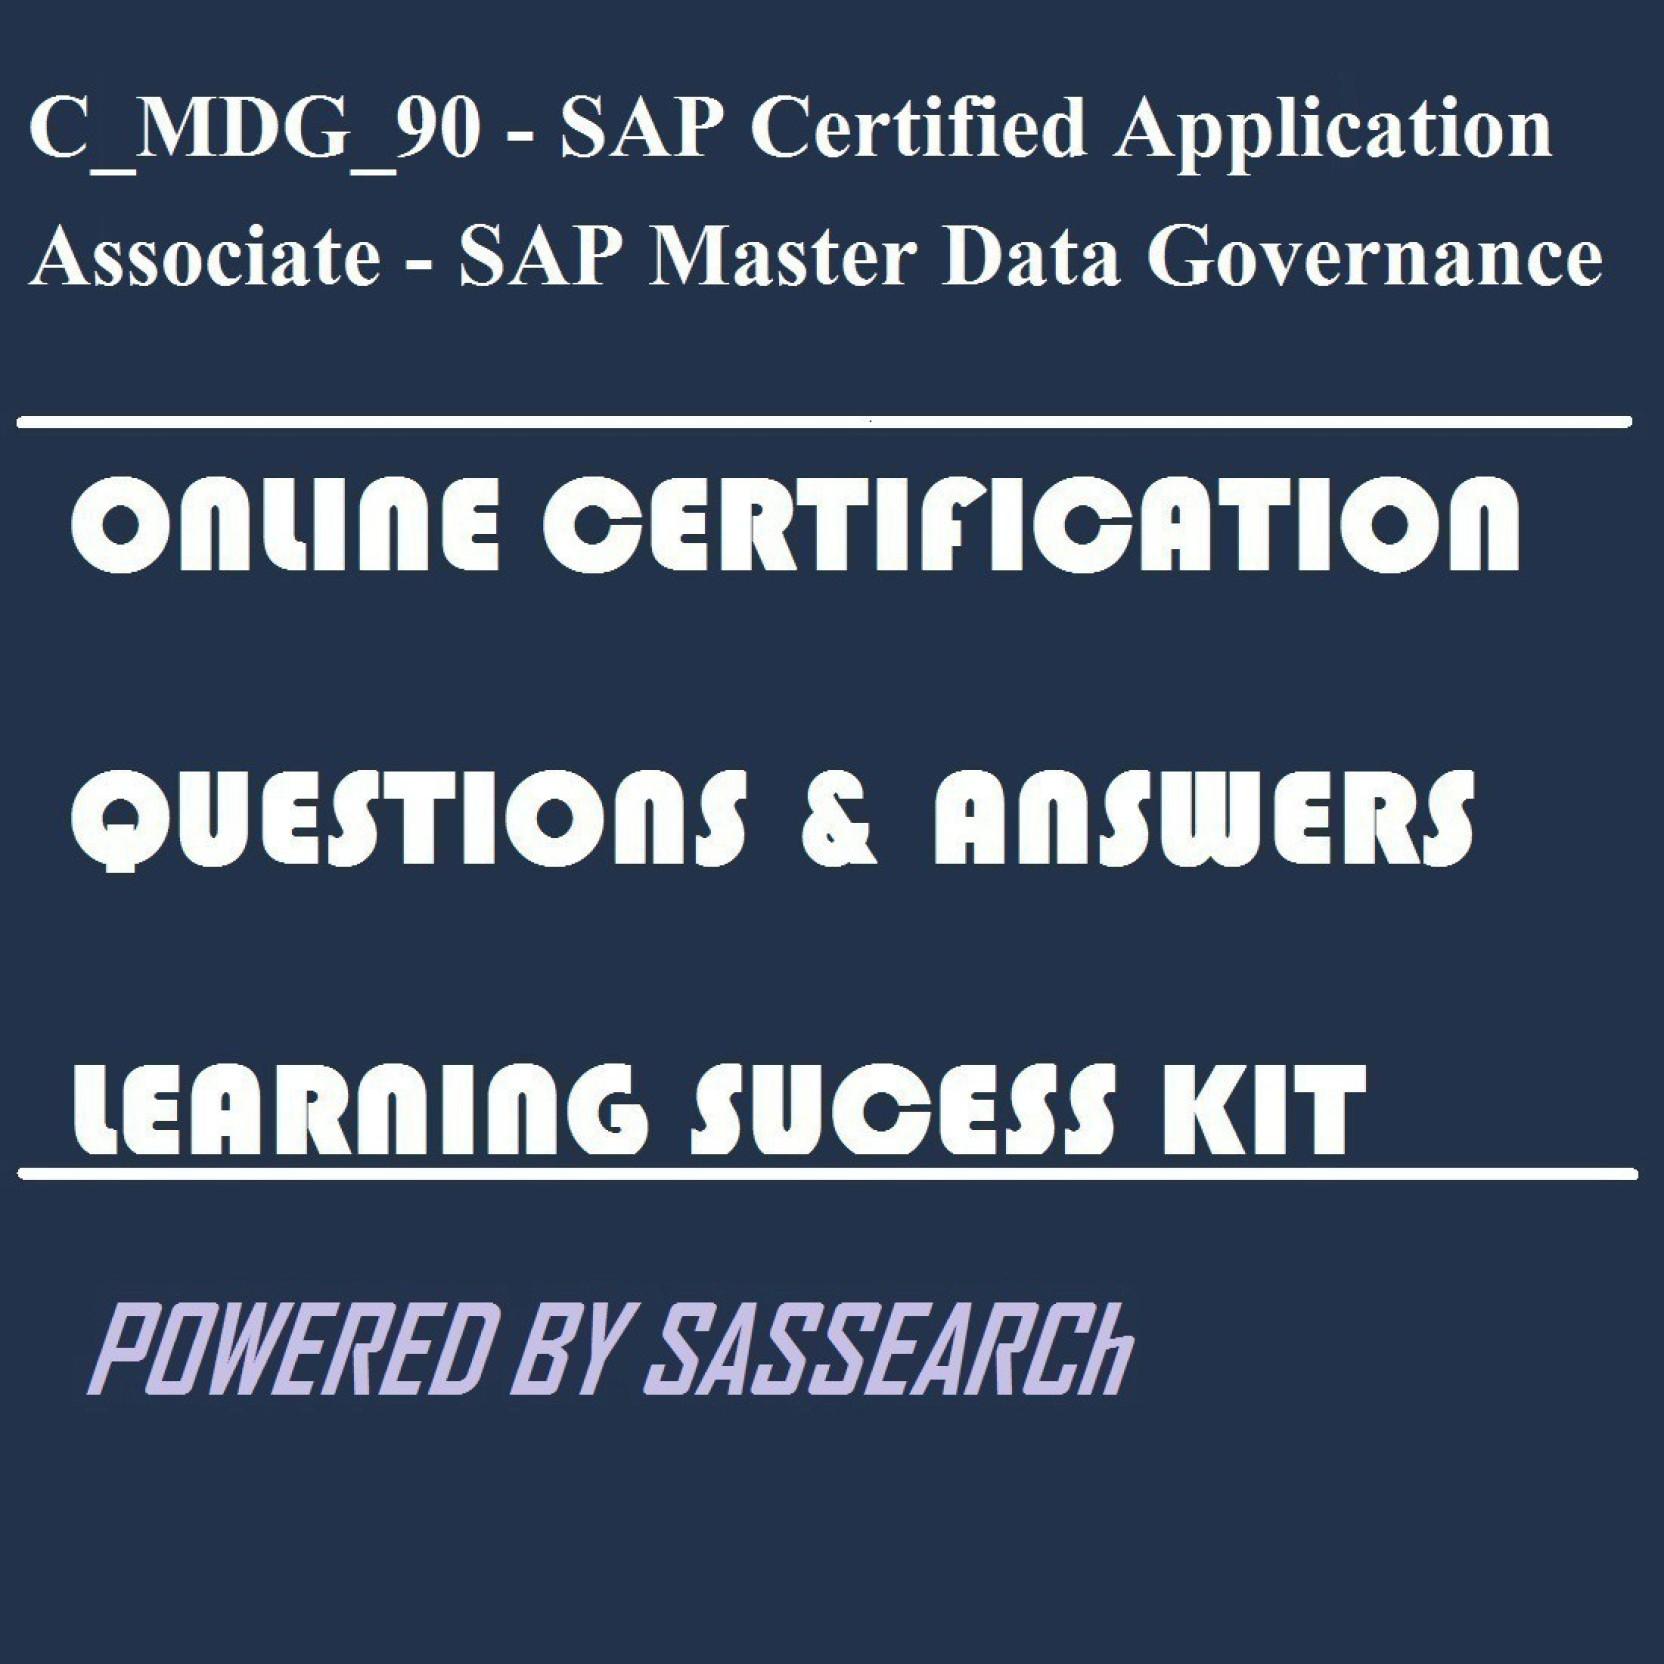 sapsmart C_MDG_90 - SAP Certified Application Associate - SAP Master ...